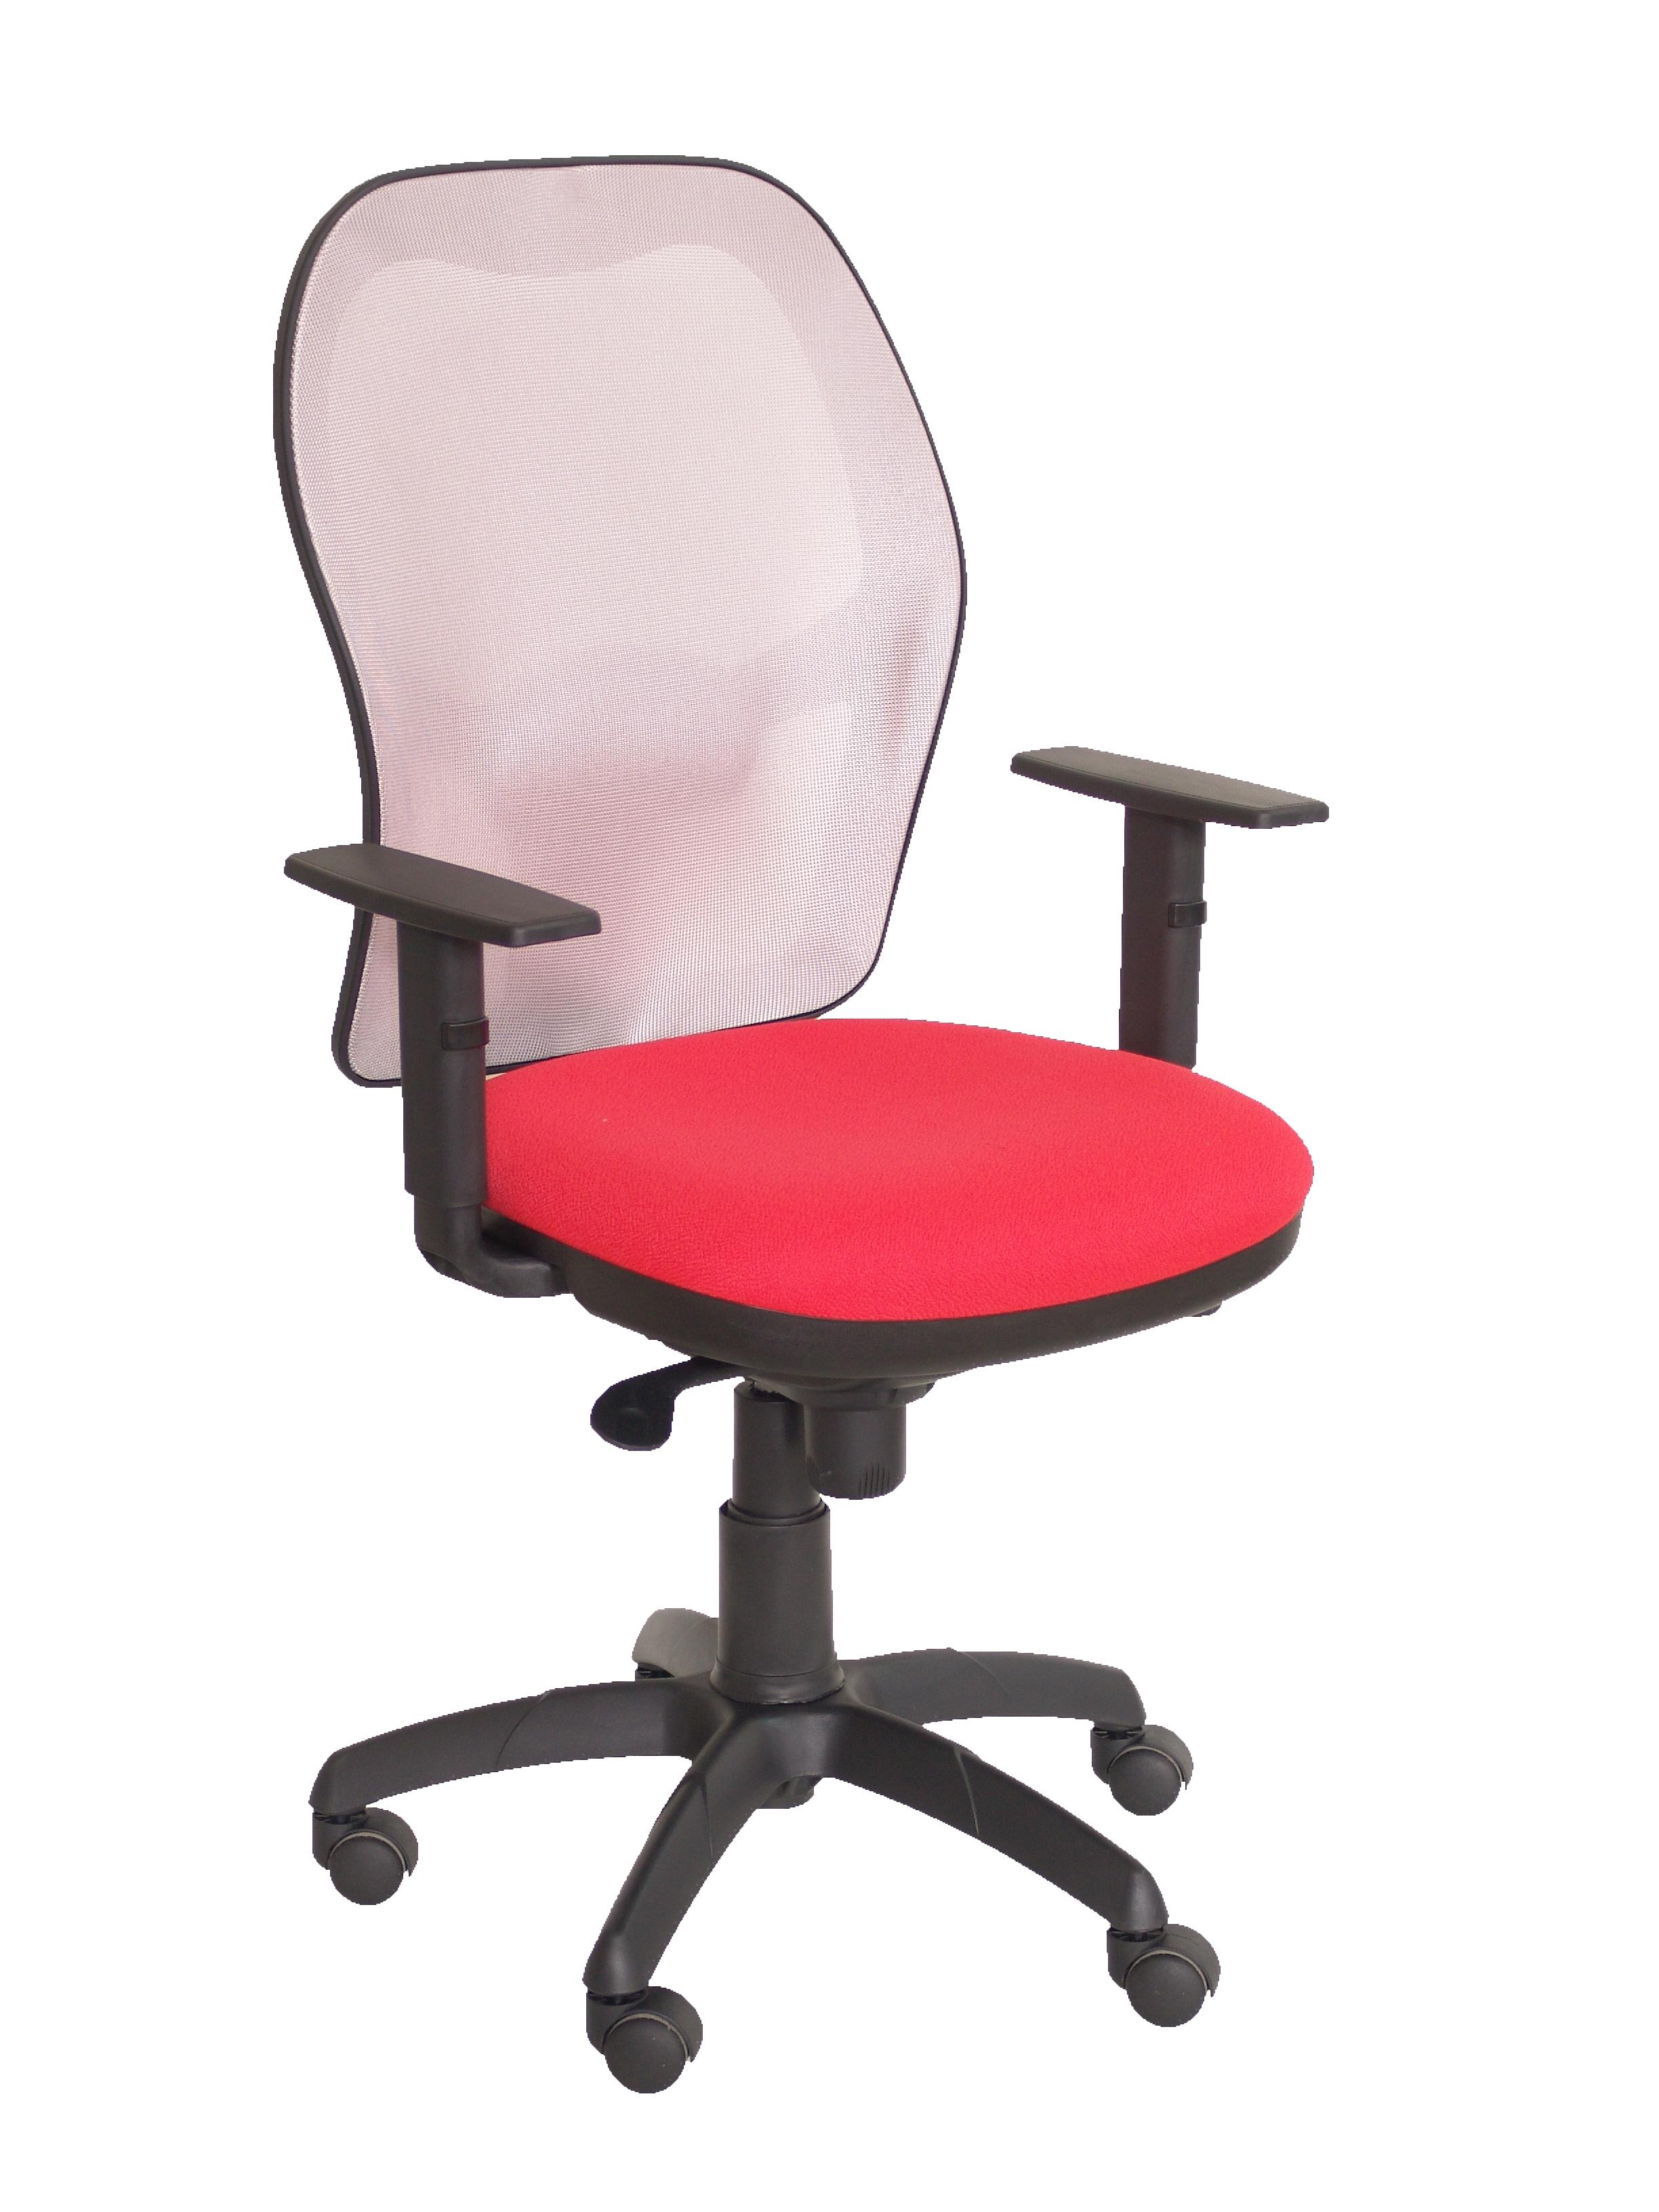 Silla Jorquera malla gris asiento bali rojo